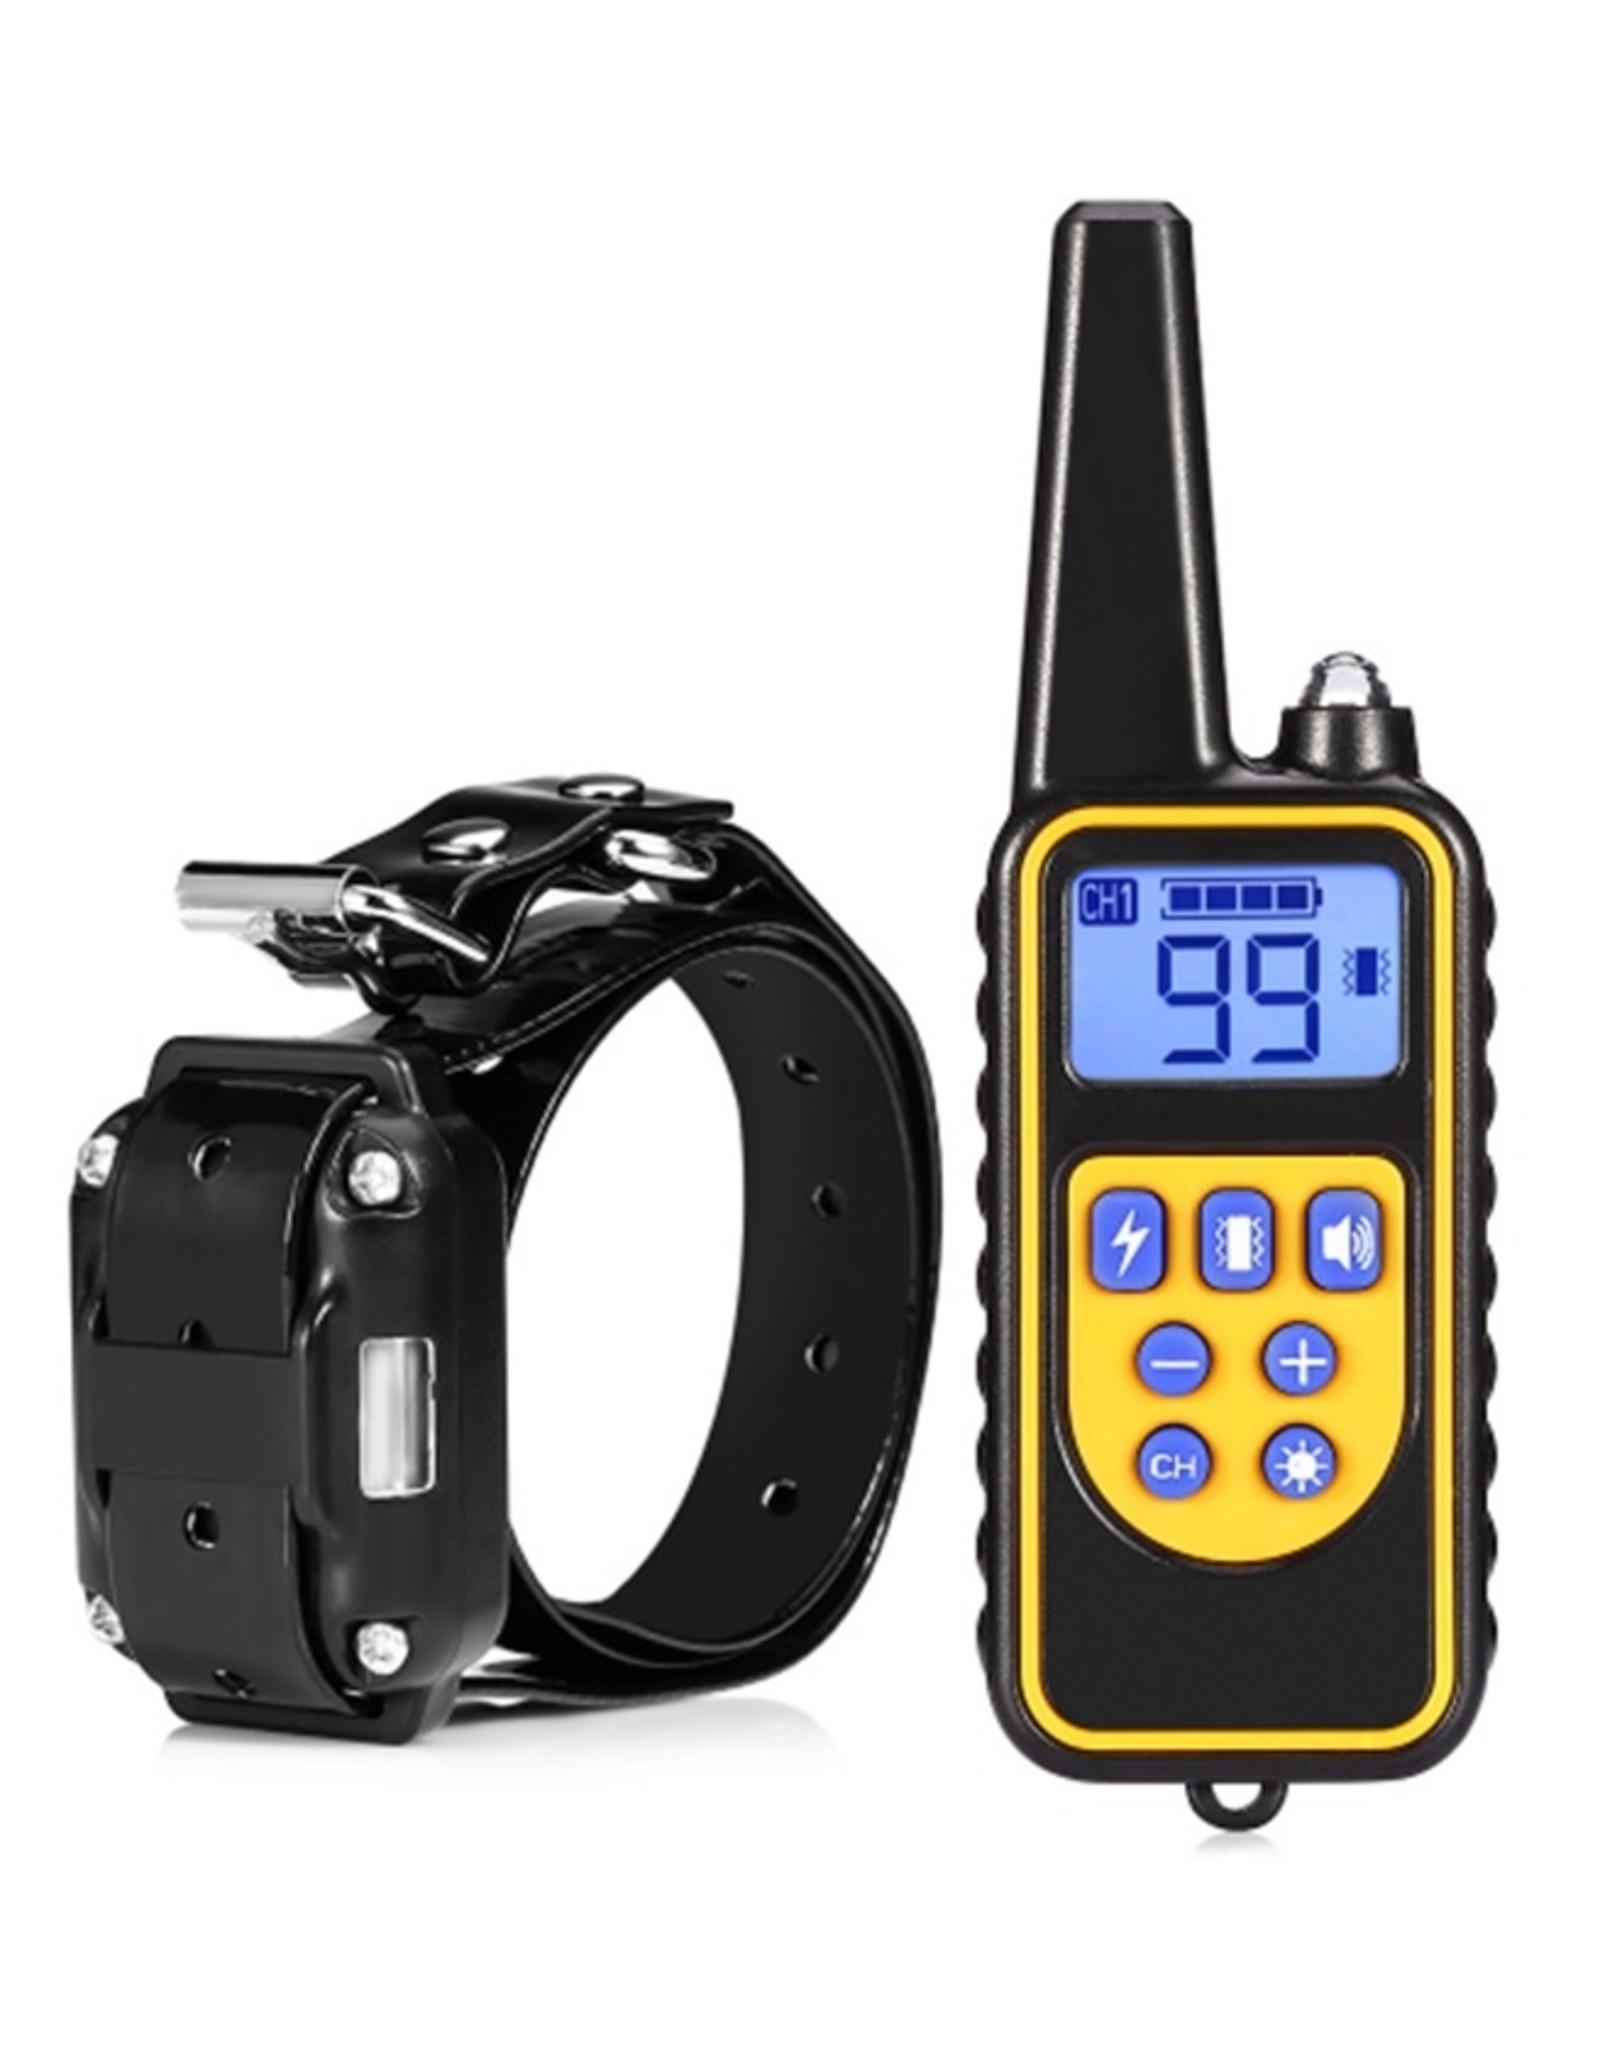 Trainingshalsband - trainingsband - teletac 800m oplaadbaar – voor 1 hond